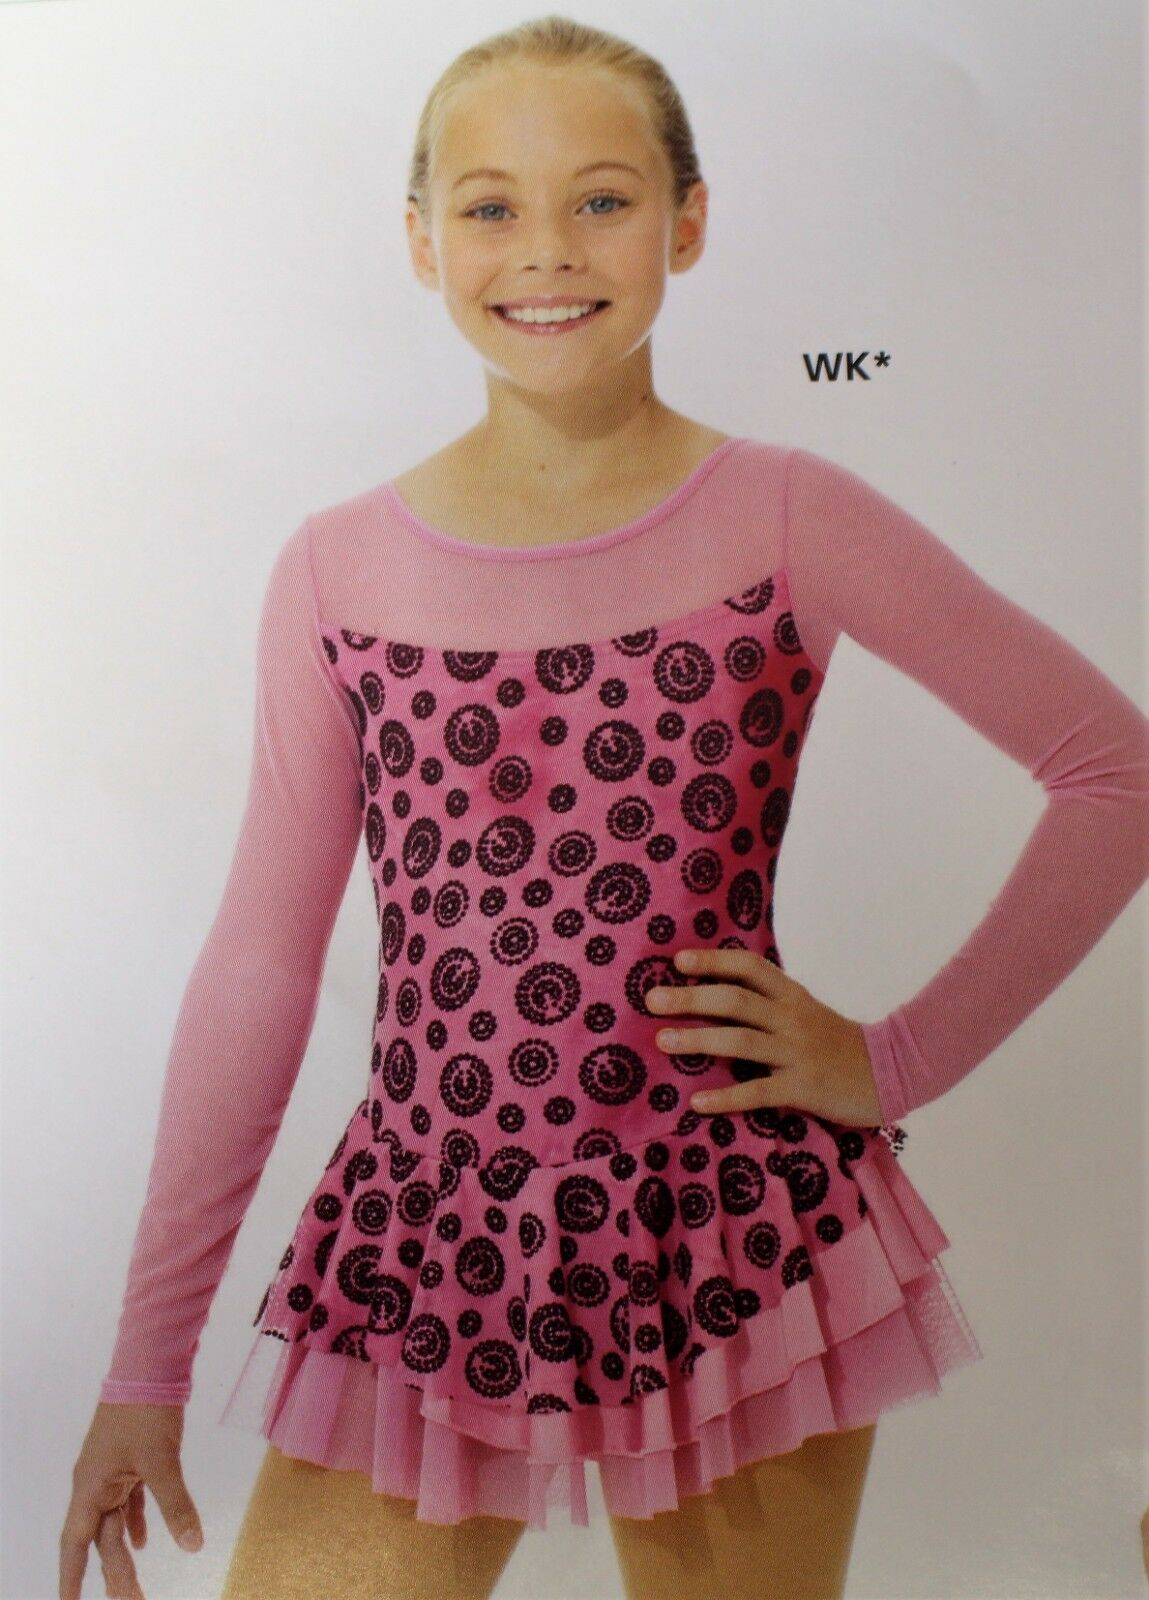 Mondor Model 669 Girls Skating Dress - WK pink